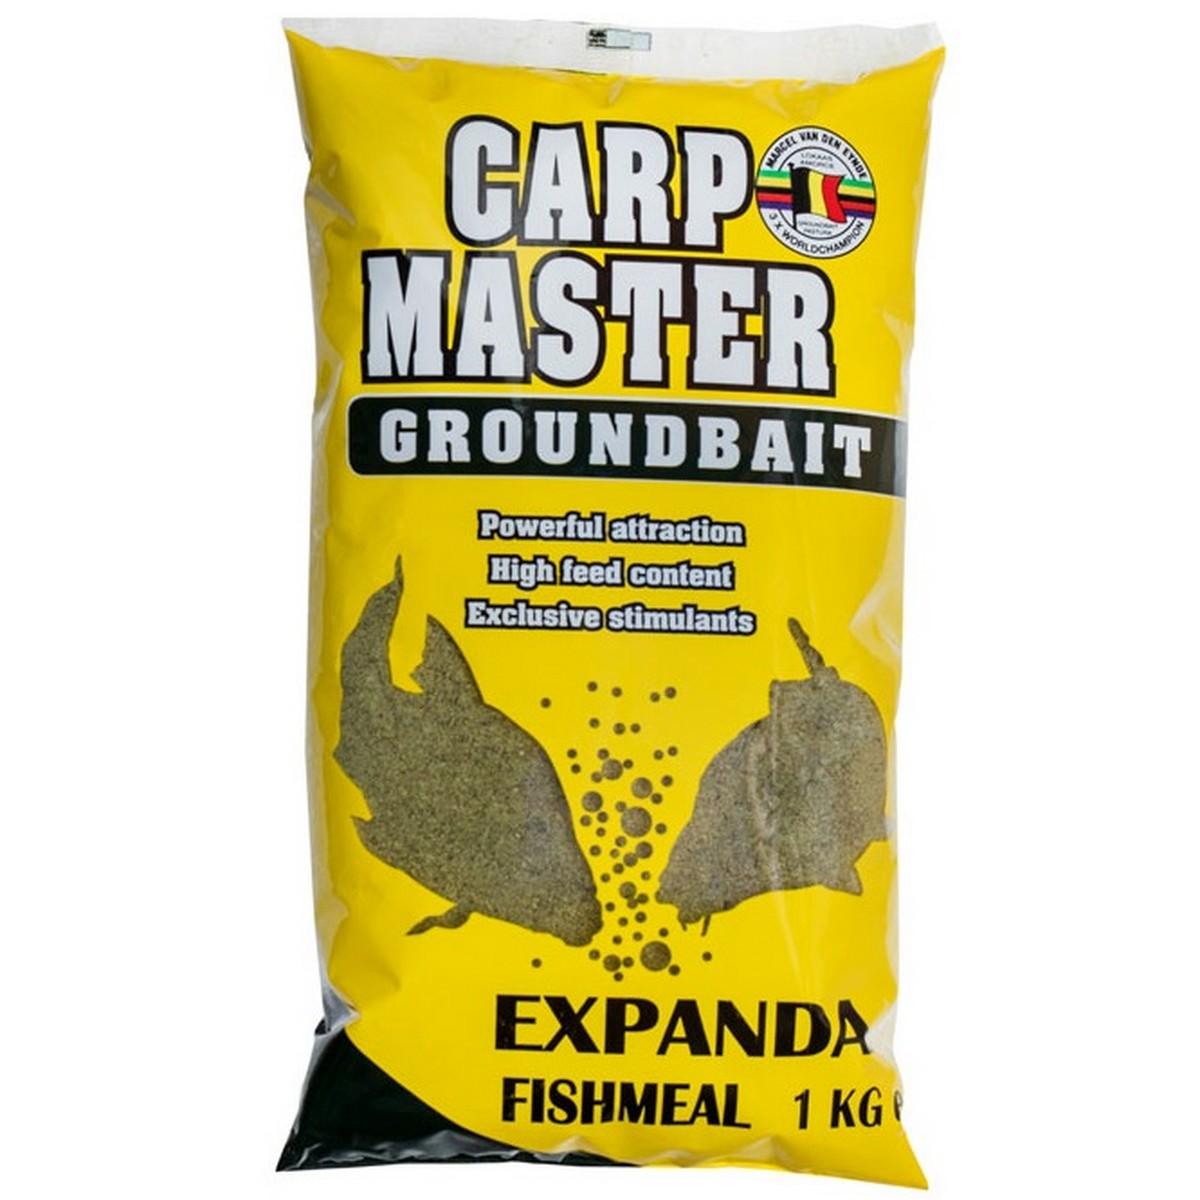 Захранка за риболов Carp Master Expanda Fishmeal 1kg - Van Den Eynde